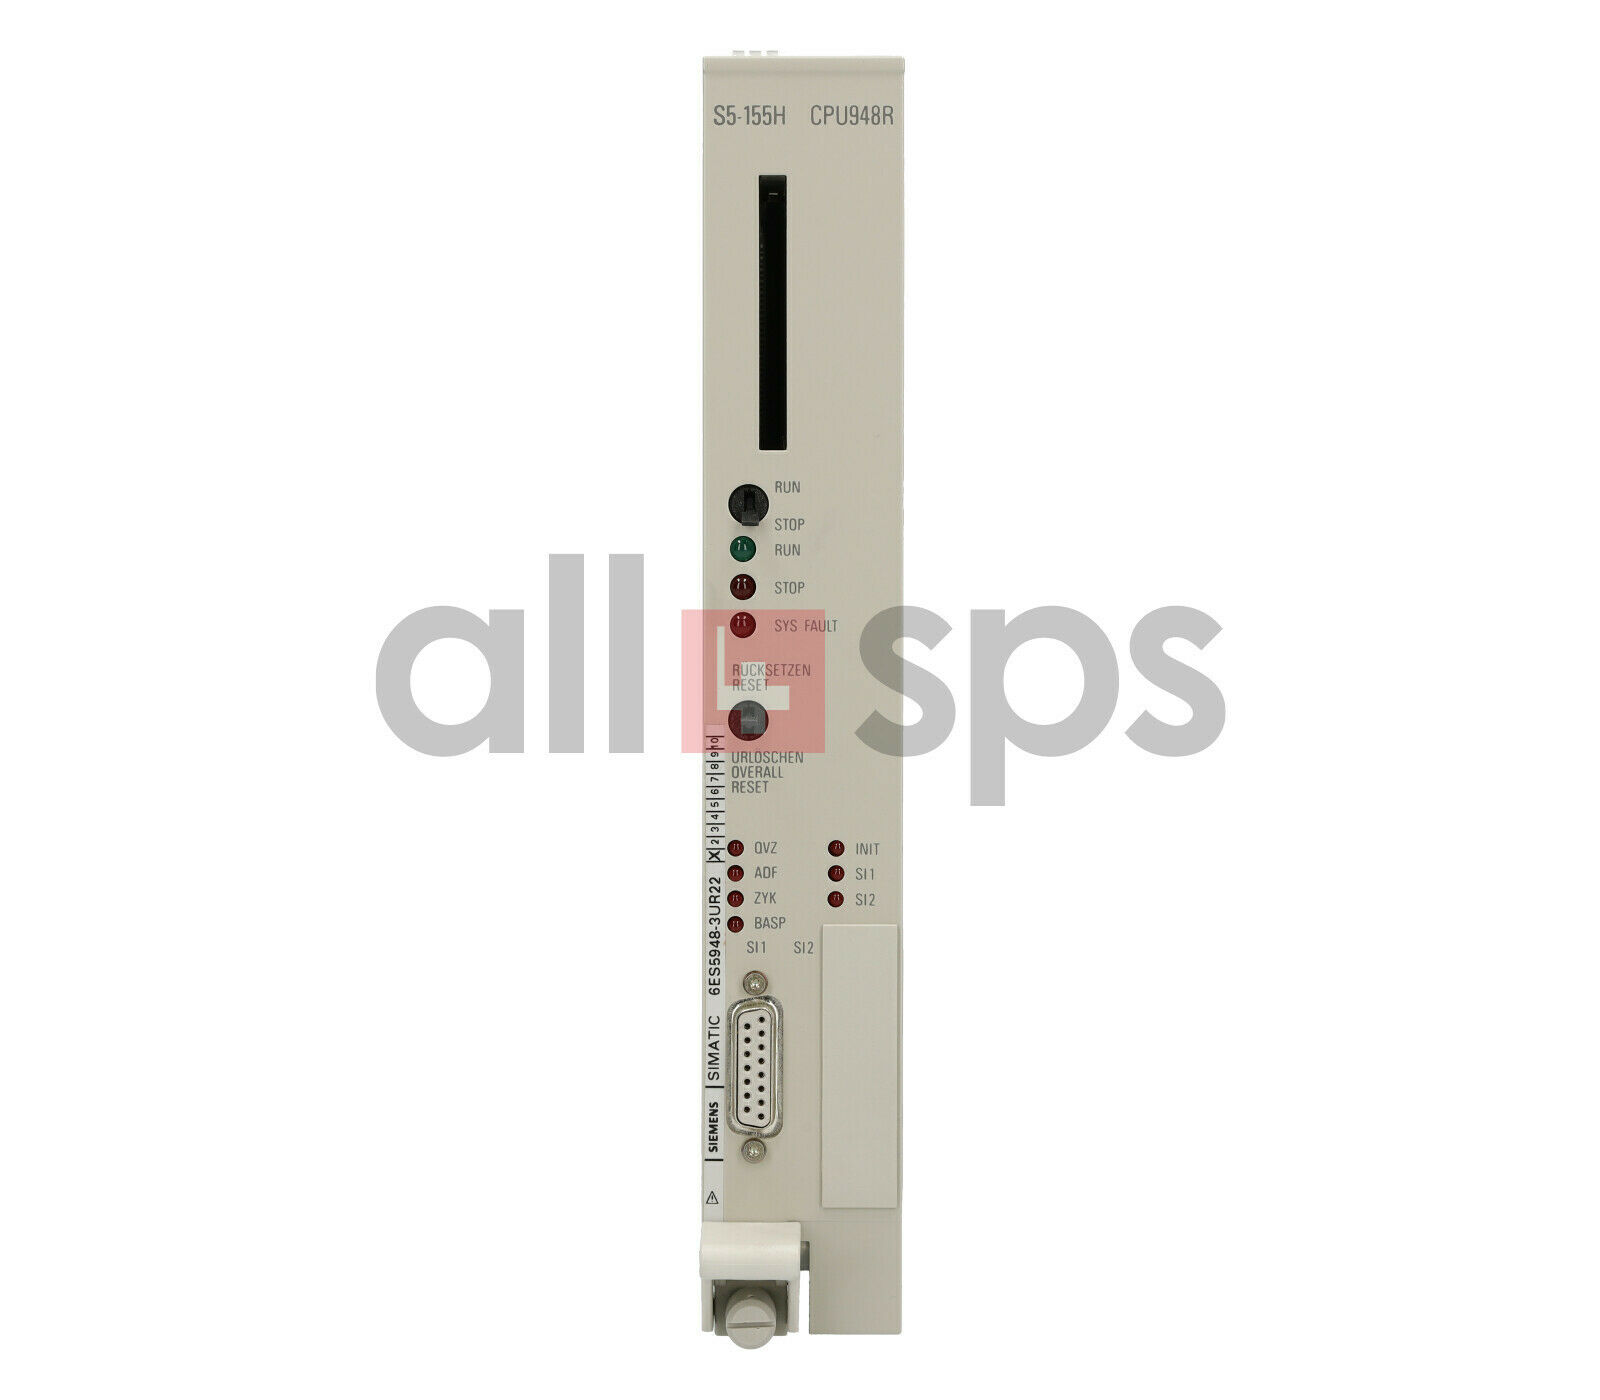 10pcs-Wima FKP2 220P 5 mm Capacitor FKP 2 O 102201 D 00 JSSD 1000 V 5/% Pitch 0.22nF